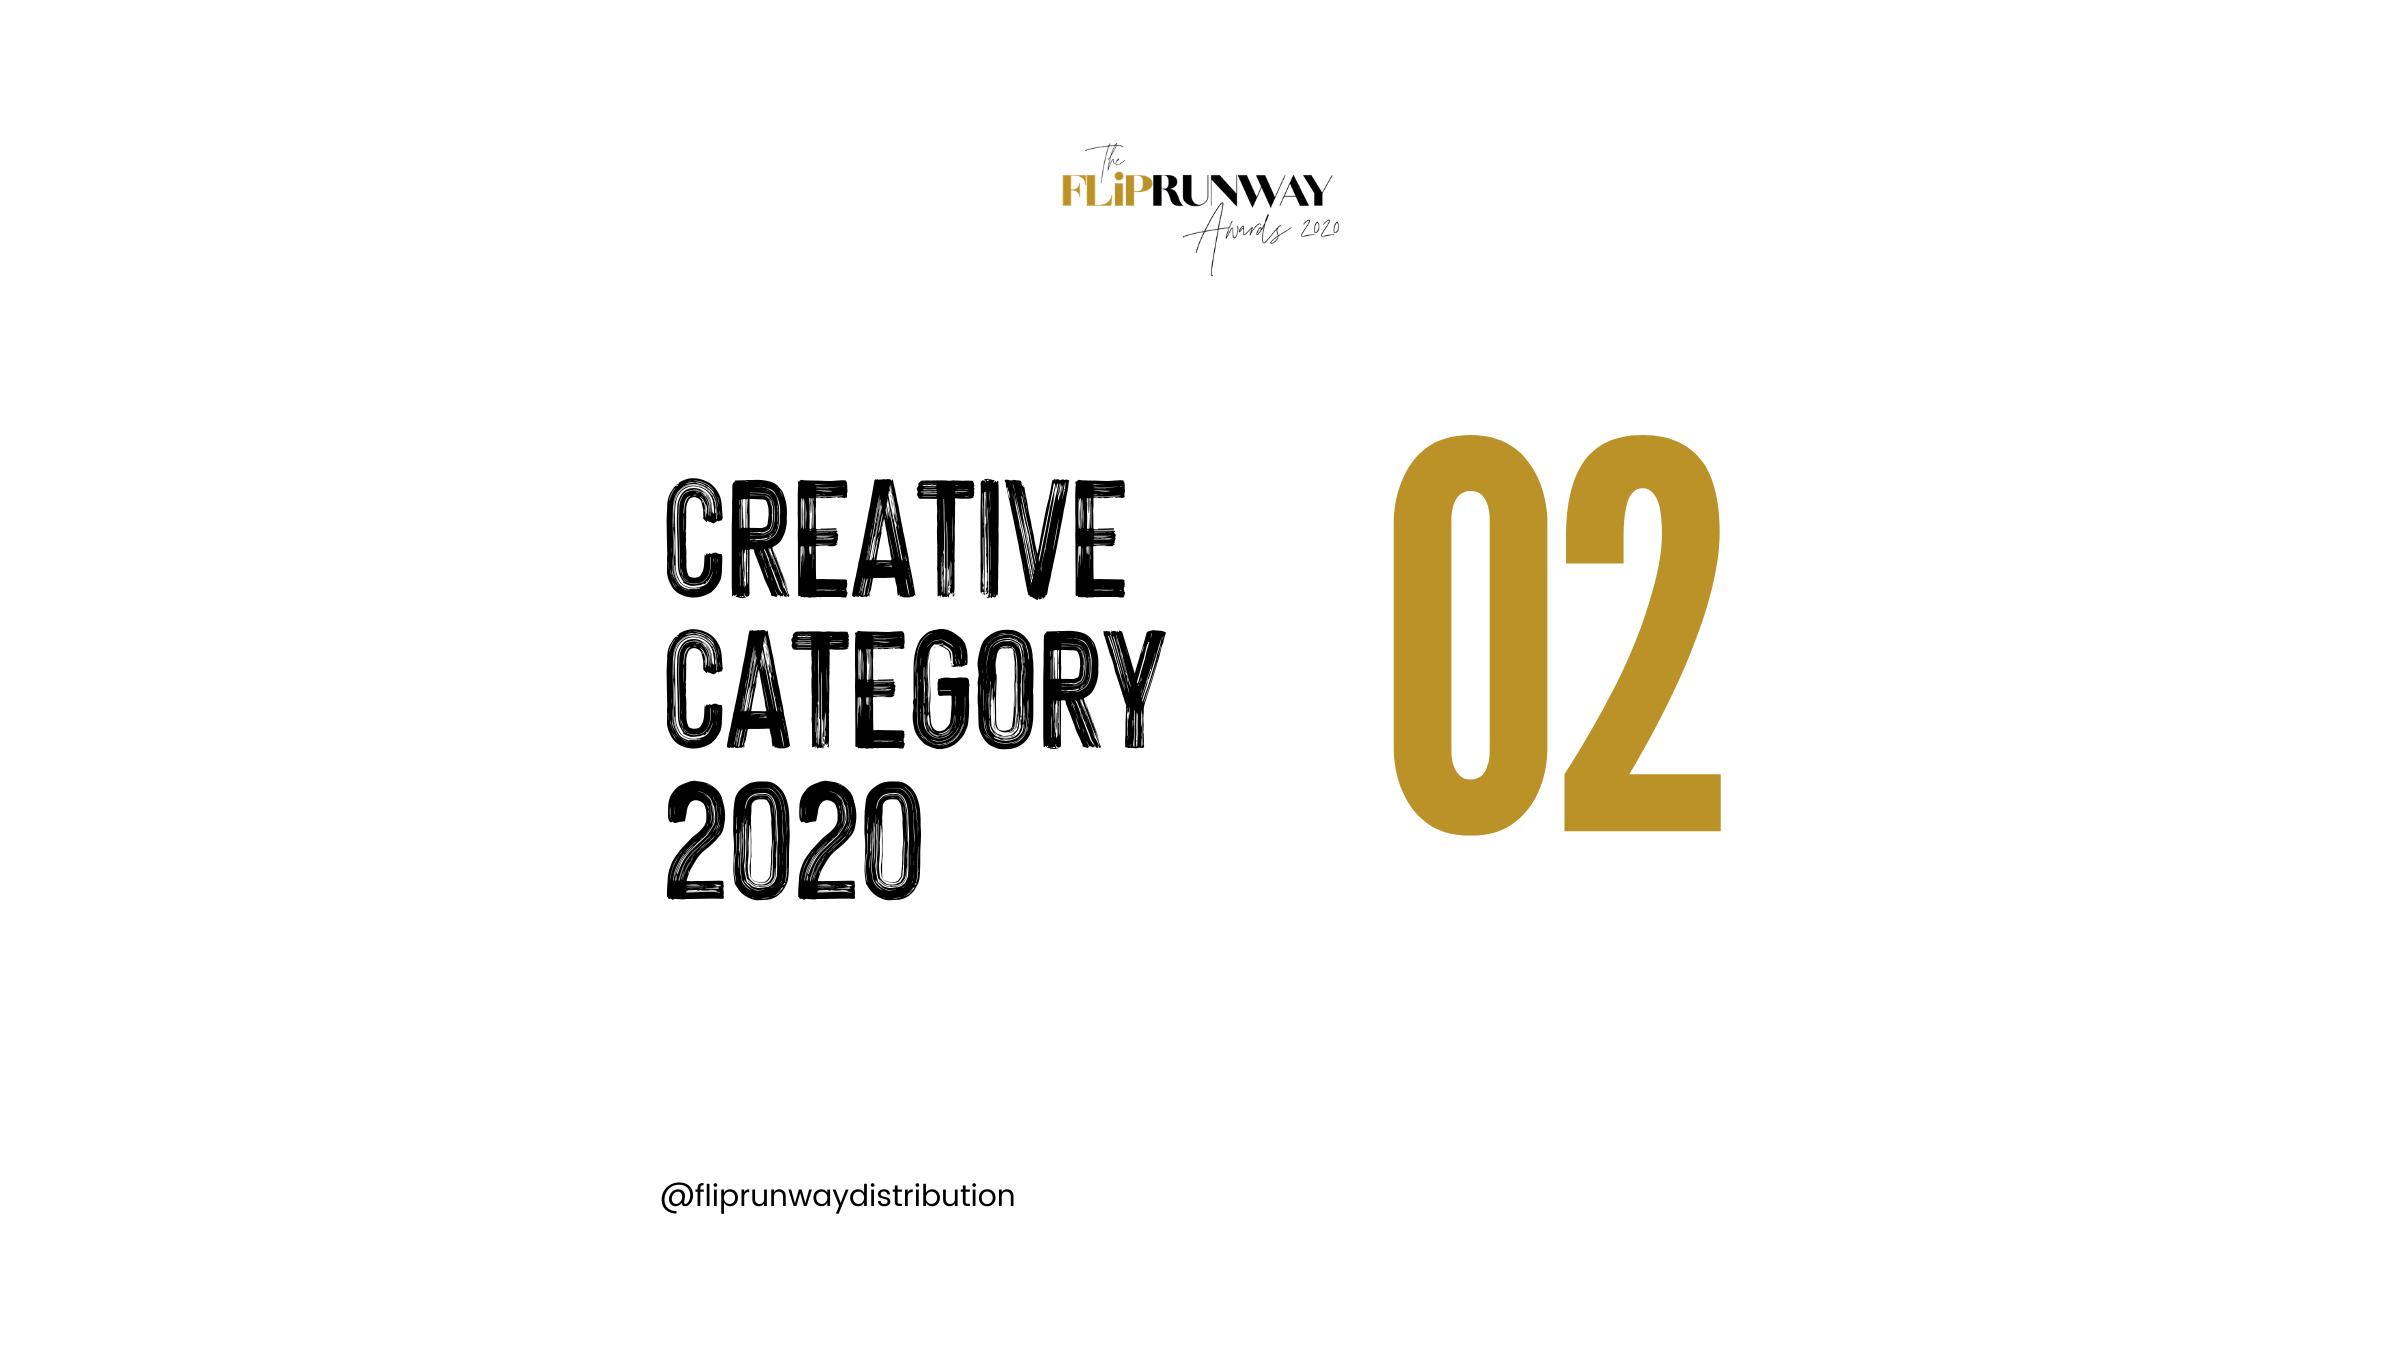 Flip Runway Creative Refinishing Award 2020